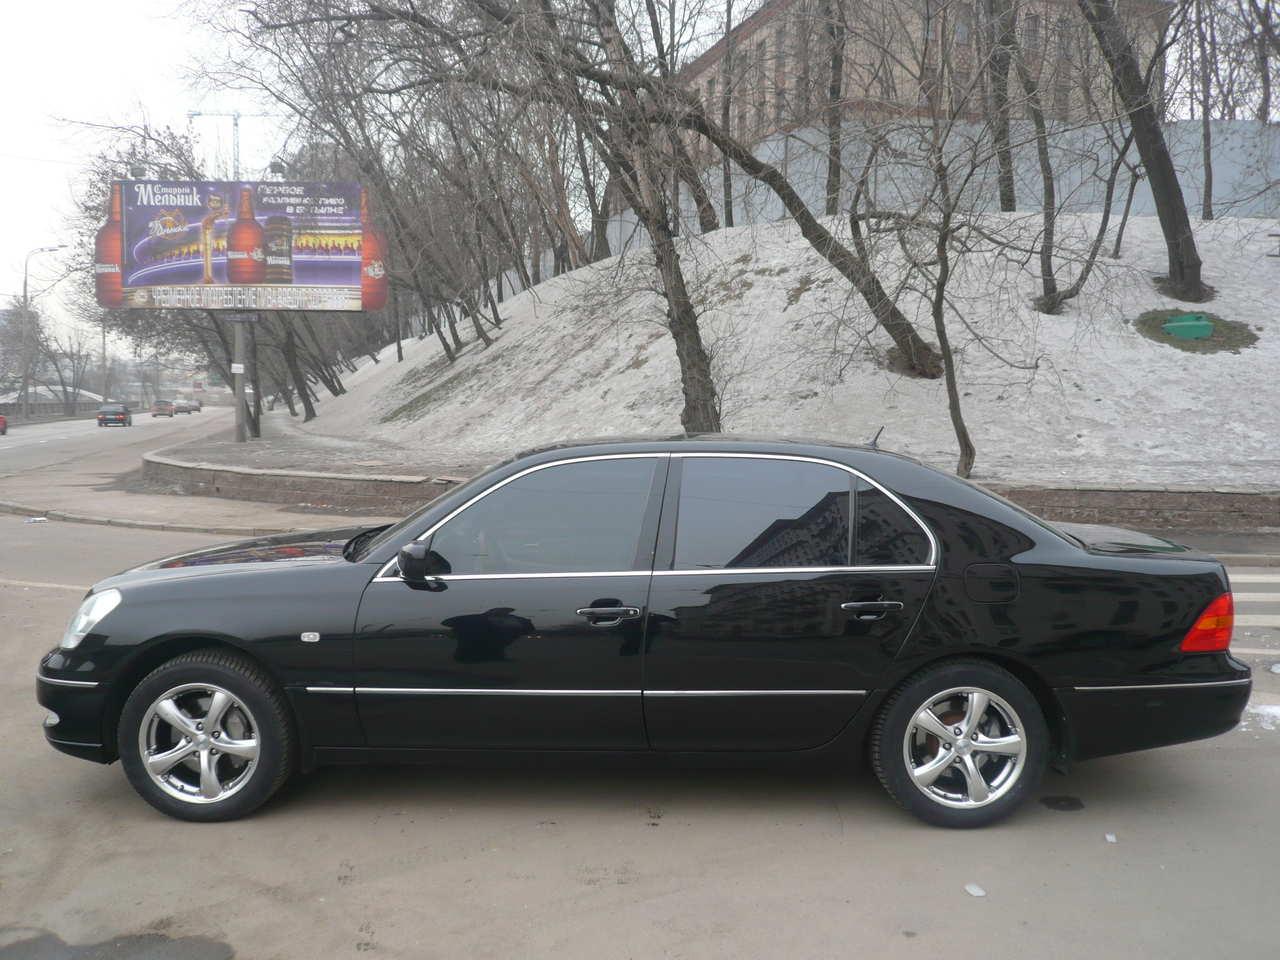 http://www.cars-directory.net/pics/lexus/ls430/2002/lexus_ls430_a1246474202b2805418_4_orig.jpg